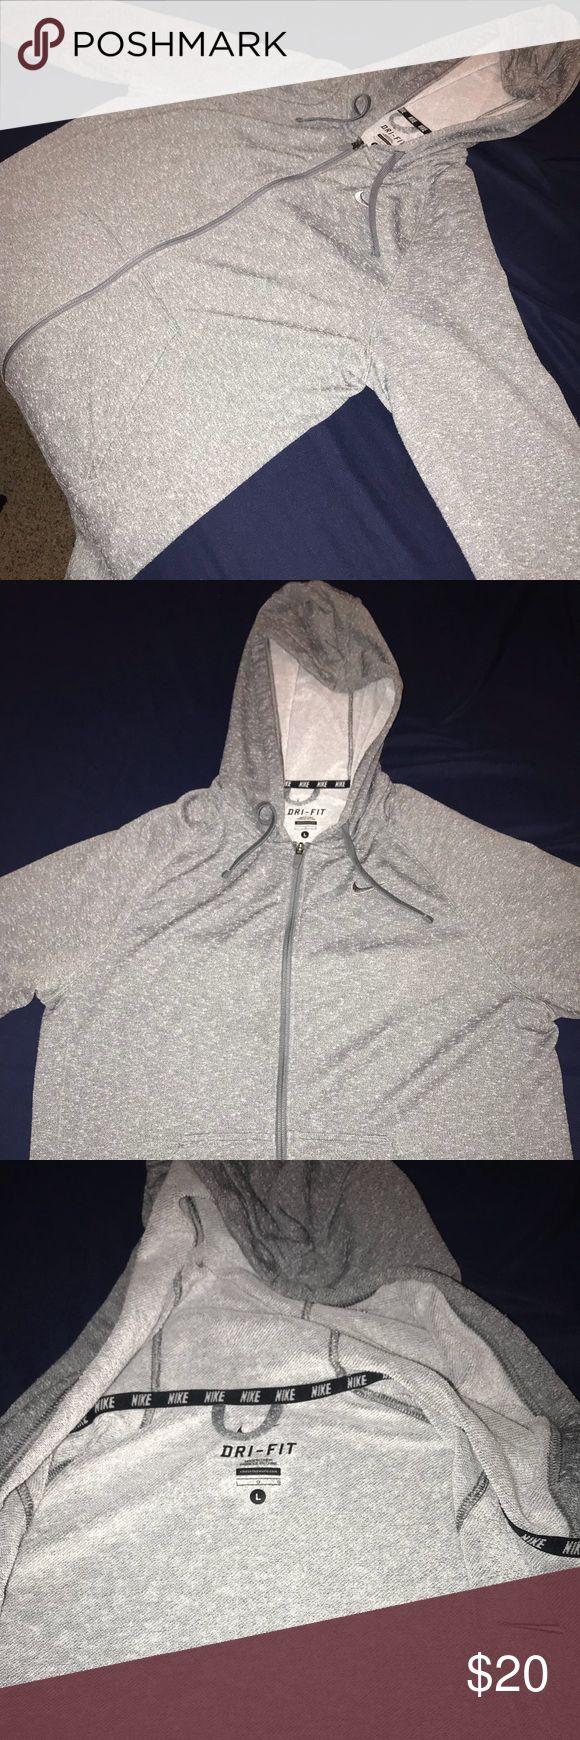 Nike Fleece Jacket Nike Fleece Jacket Used, but in great condition Size Large No Trades Best Offer Nike Jackets & Coats Lightweight & Shirt Jackets